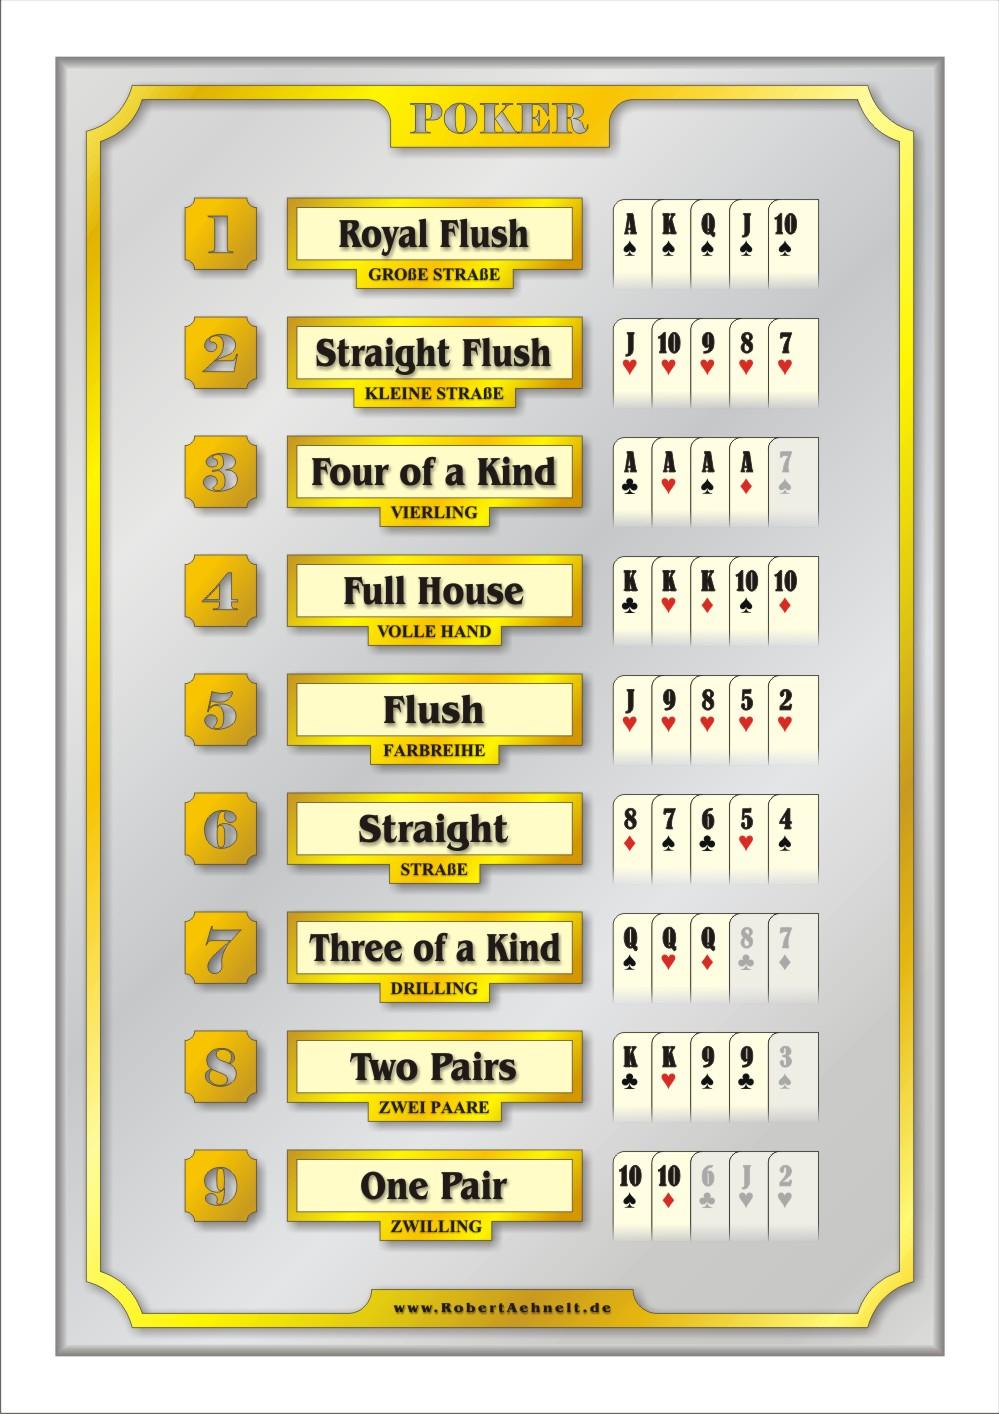 www online casino poker jetzt spielen